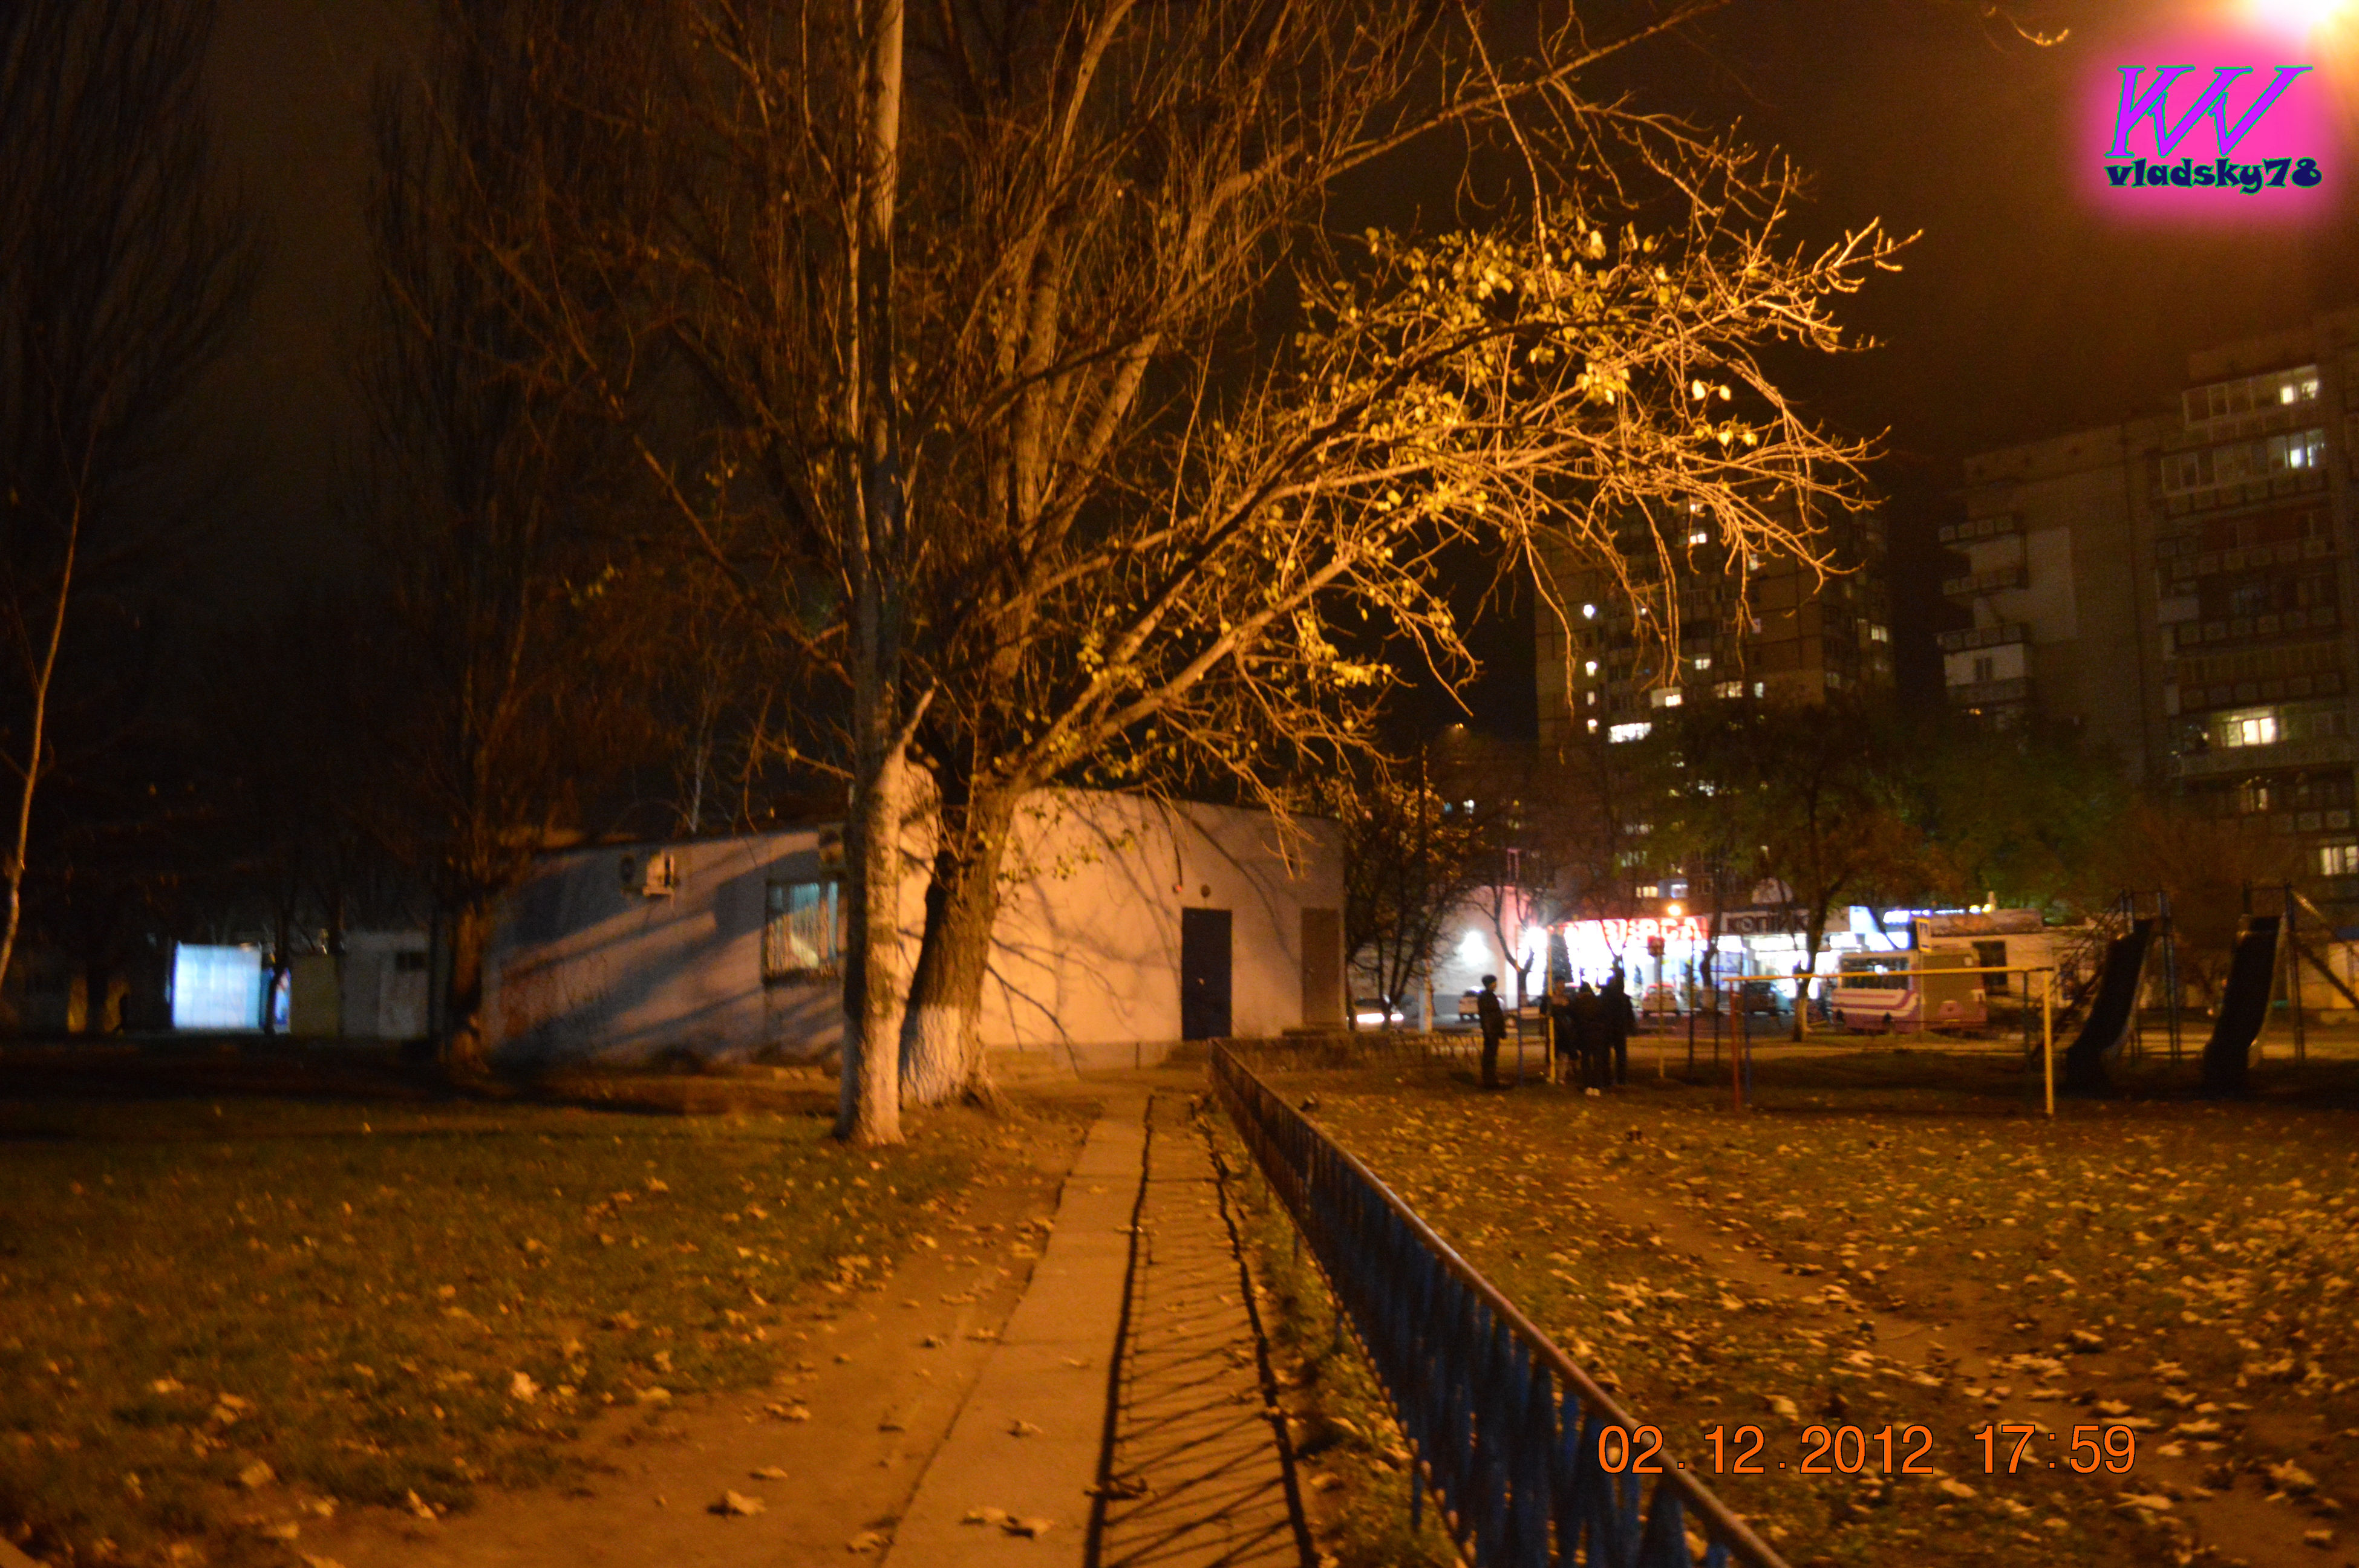 night, illuminated, tree, outdoors, city, no people